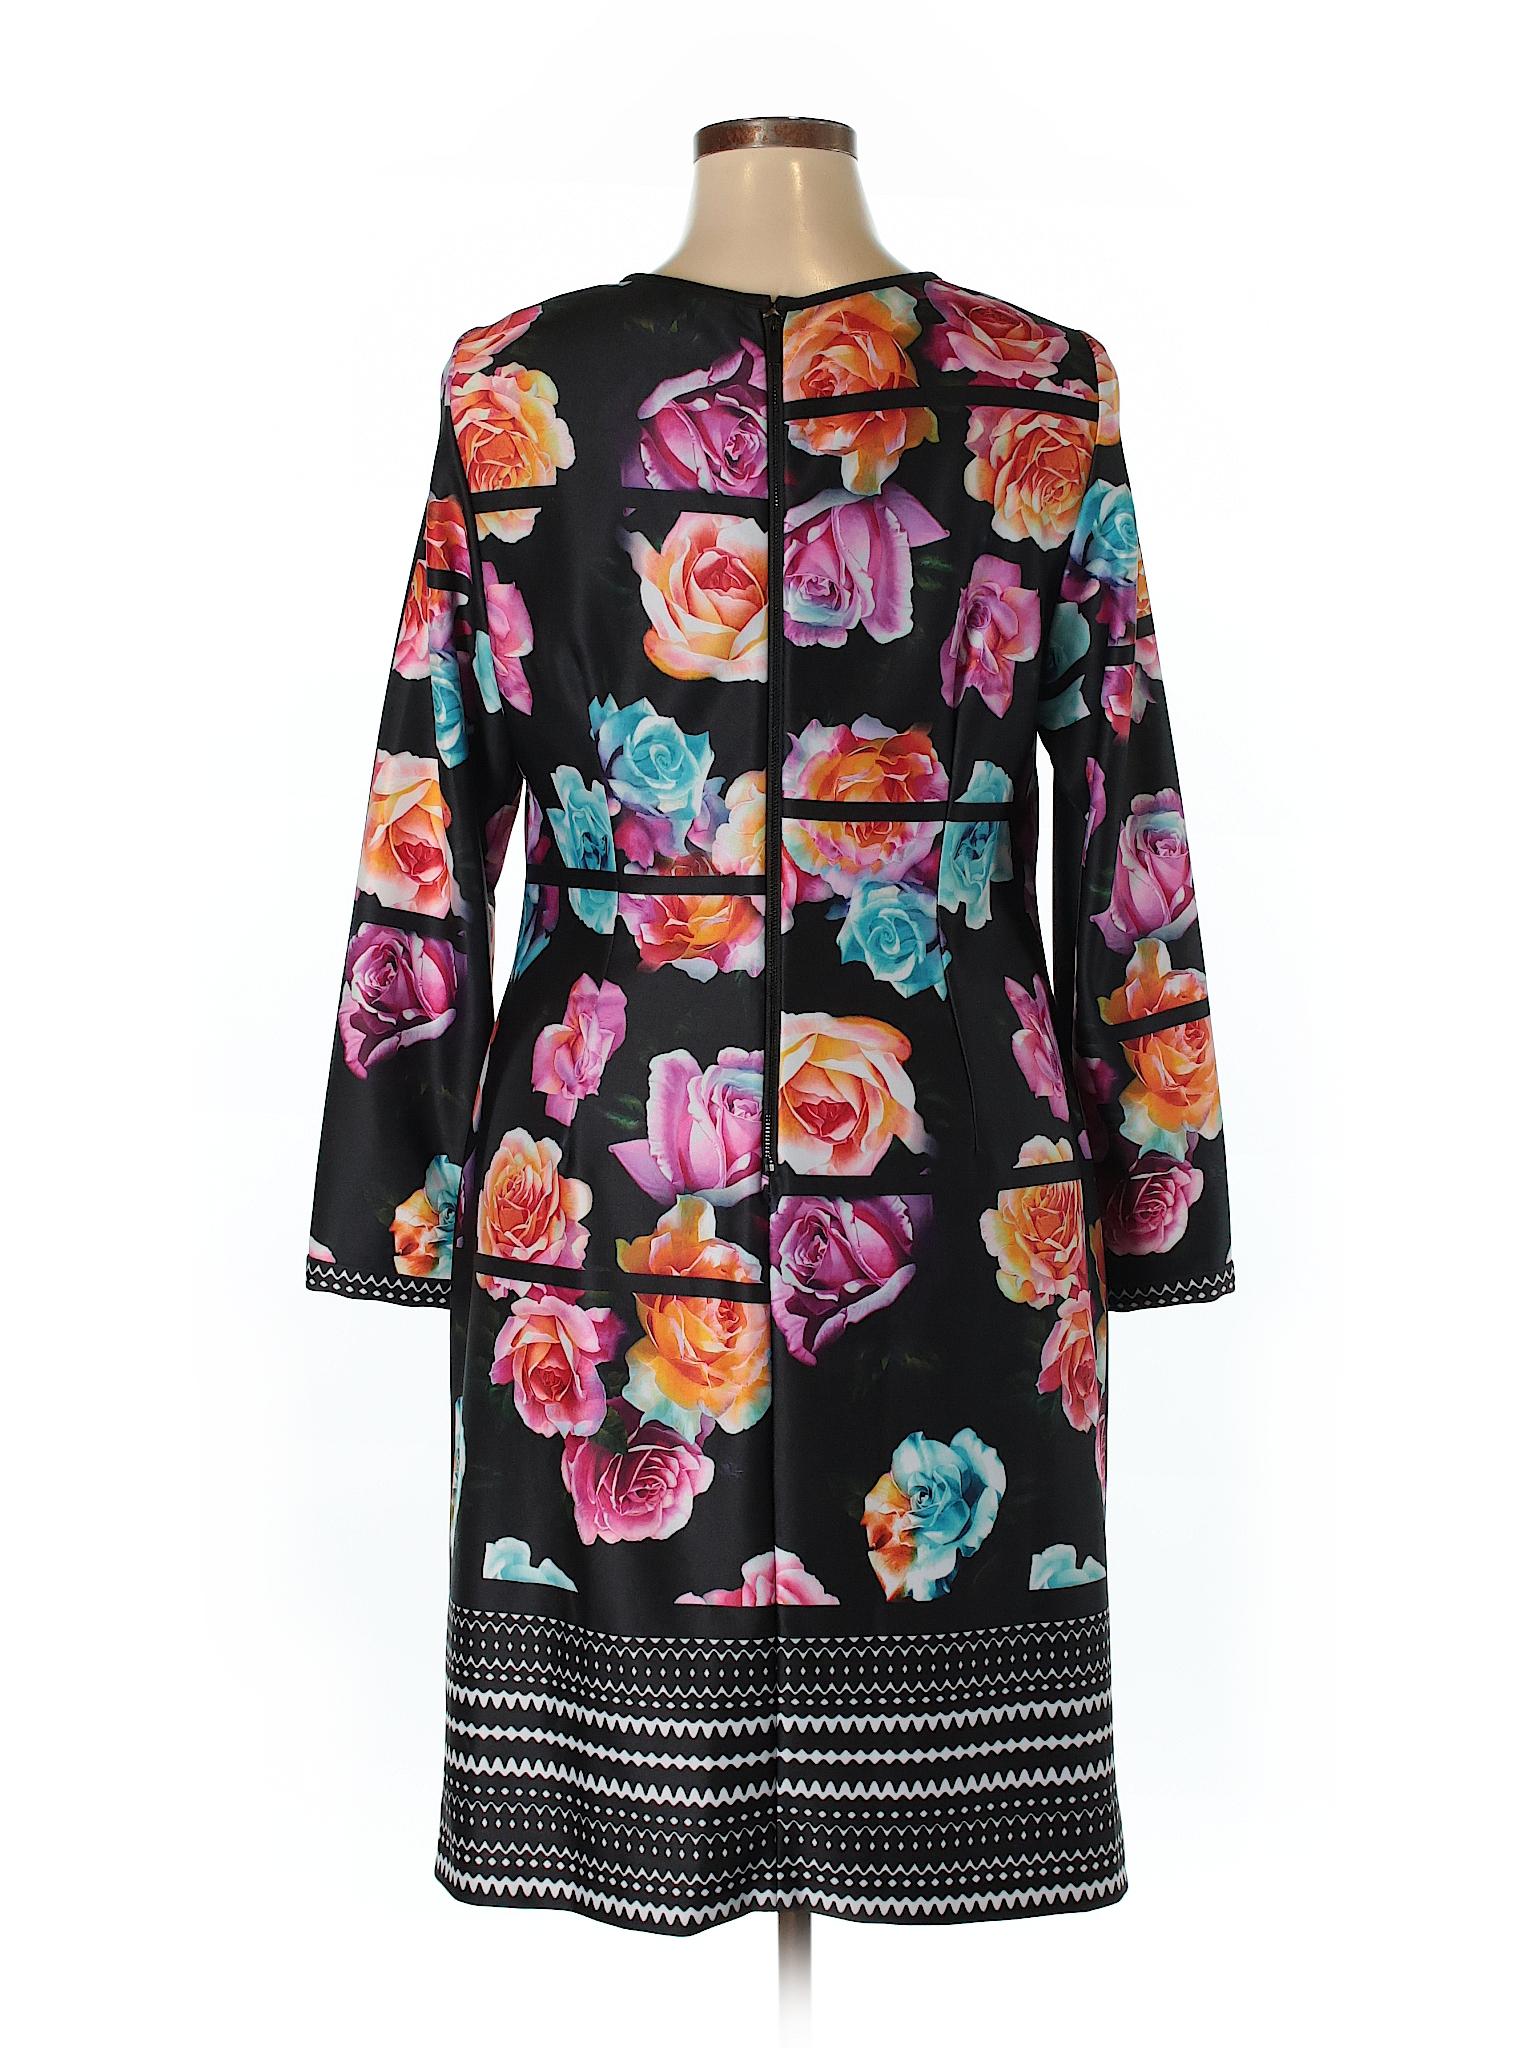 Winter Julia Jordan Casual Boutique Dress gYSXqBBf